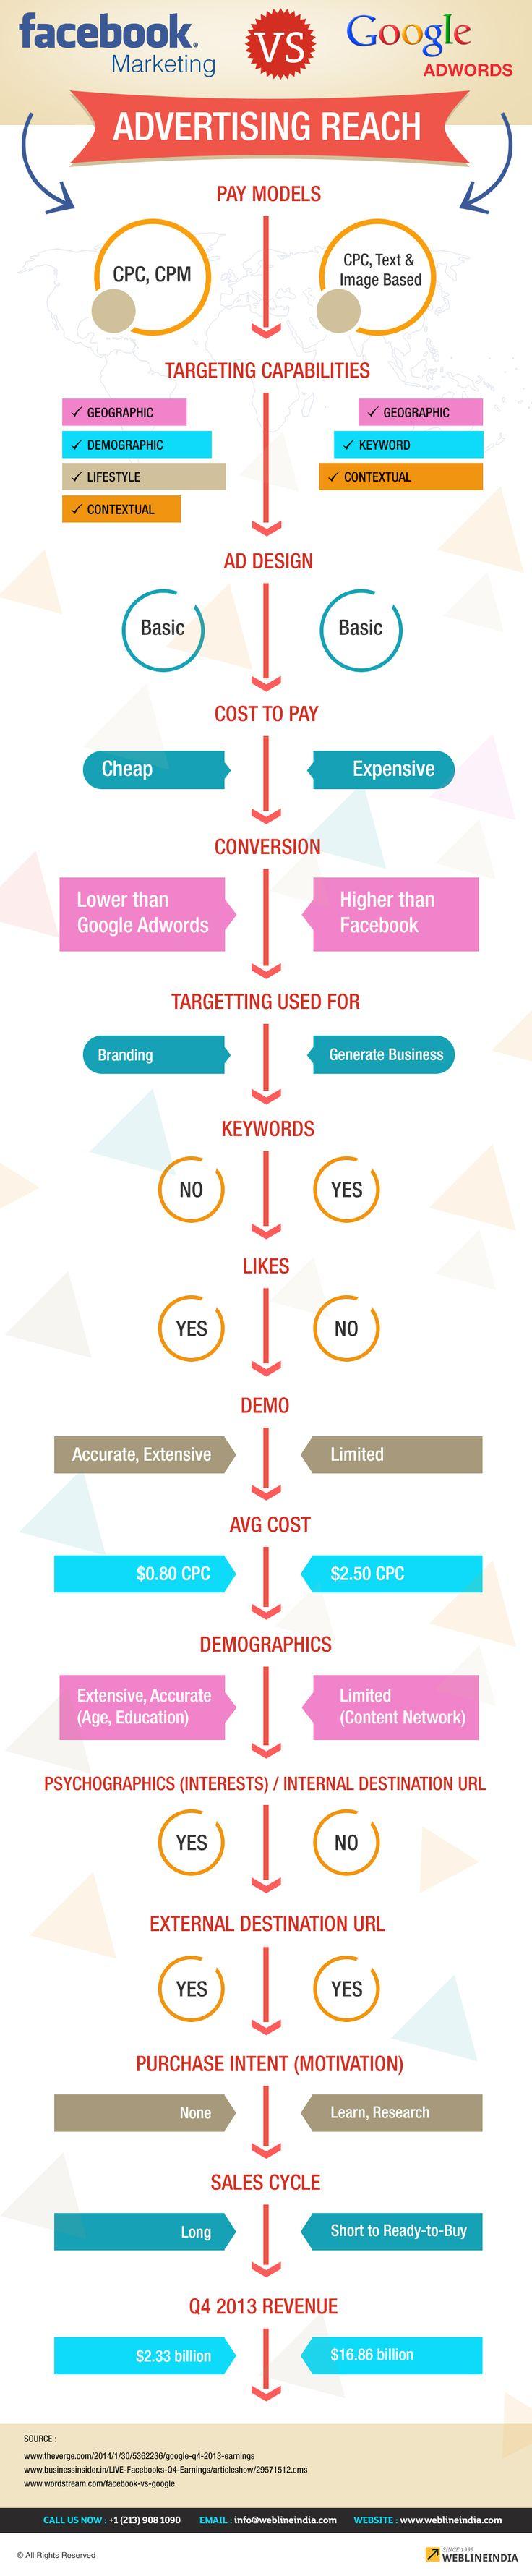 Facebook Marketing vs Google Adwords.  #Facebook #Adwords #Marketing